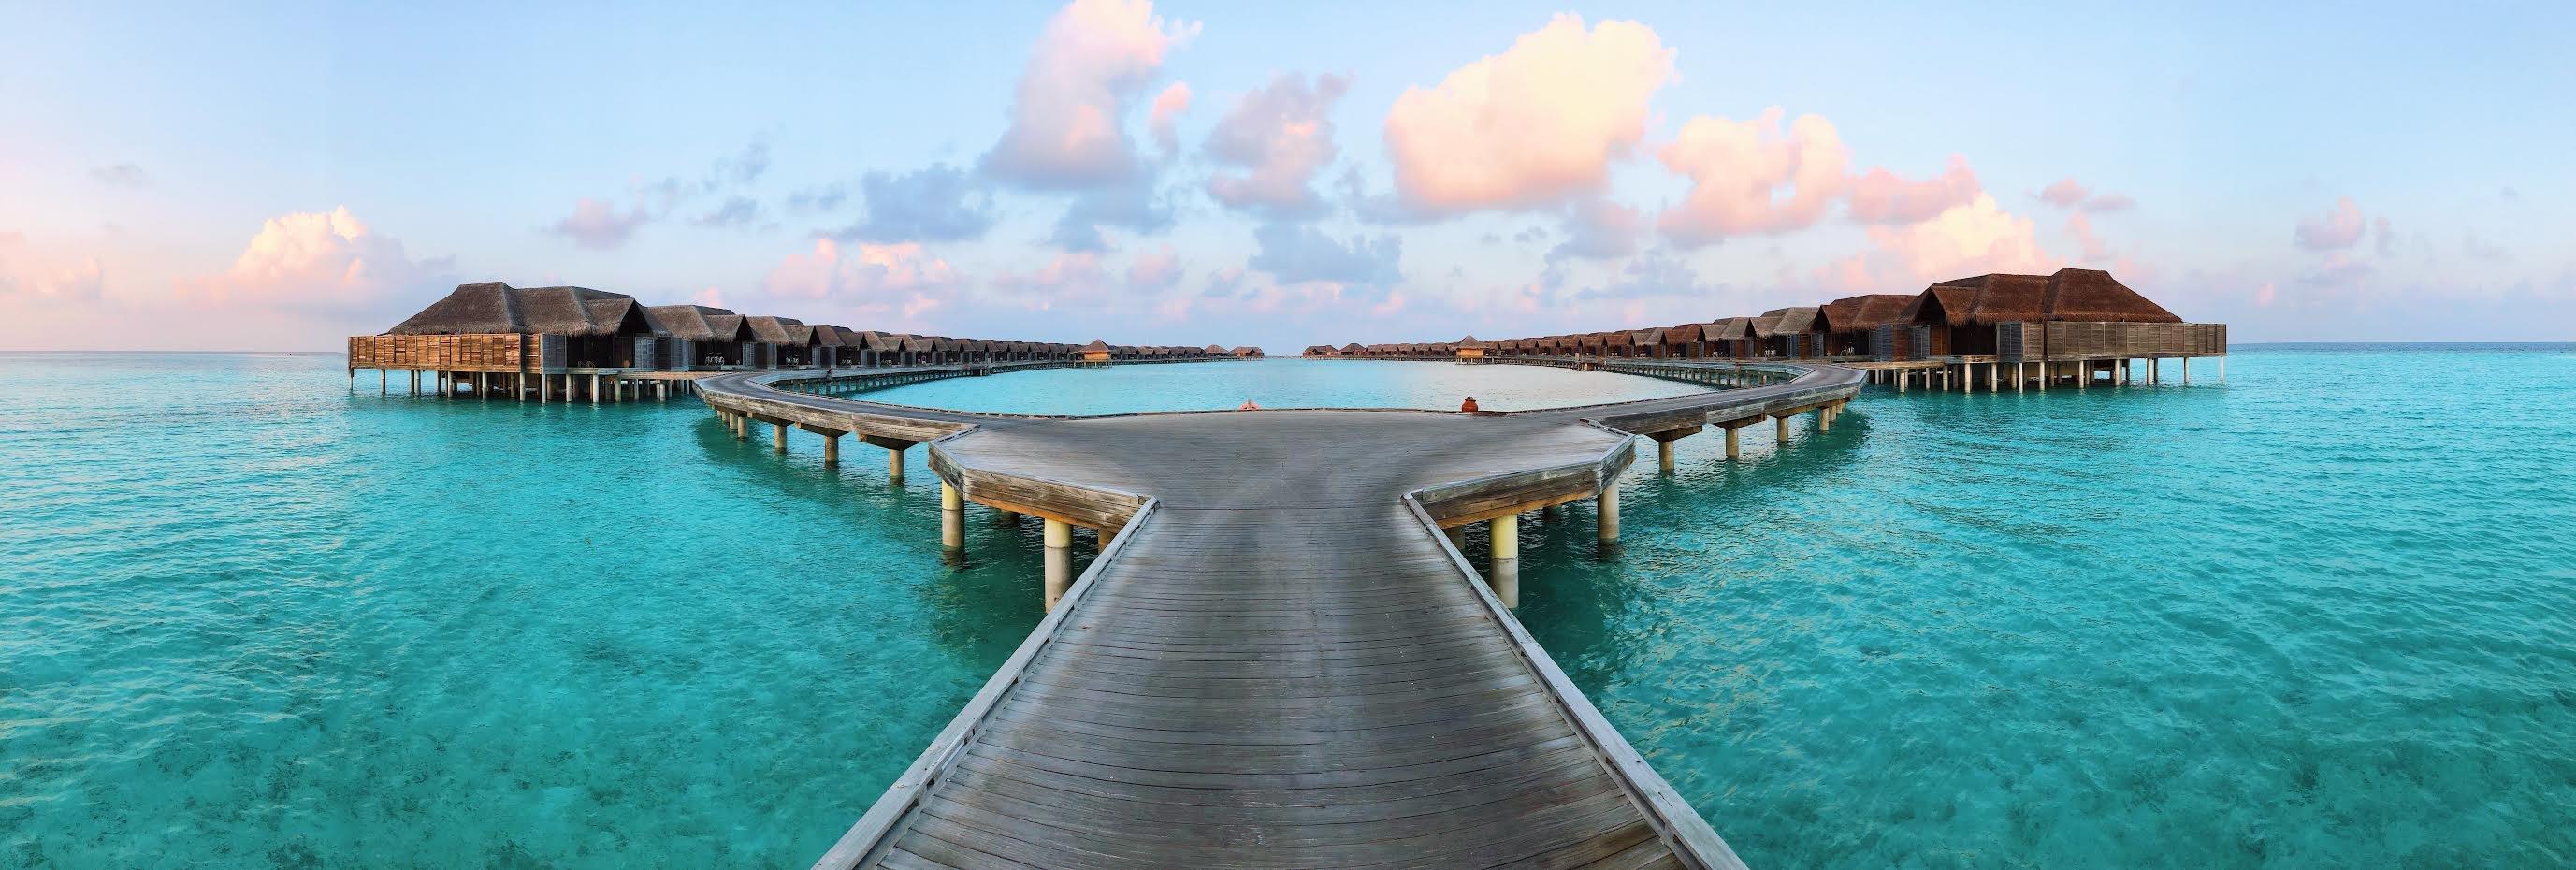 Muslim-travel-blog-complete-travel-guide-Maldives-overwater-villas